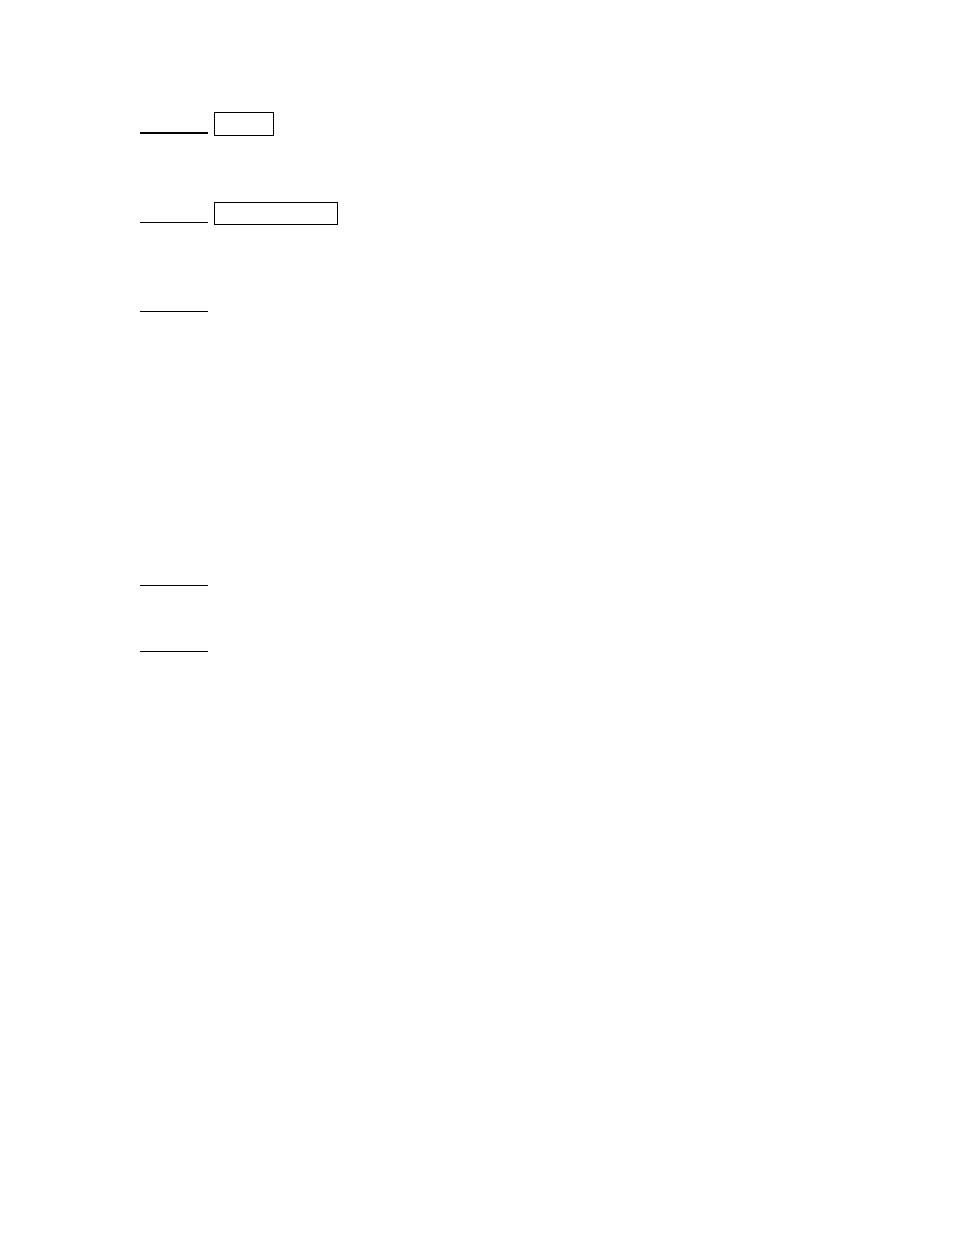 firstech llc compustar cm3000 user manual page 7 8 rh manualsdir com